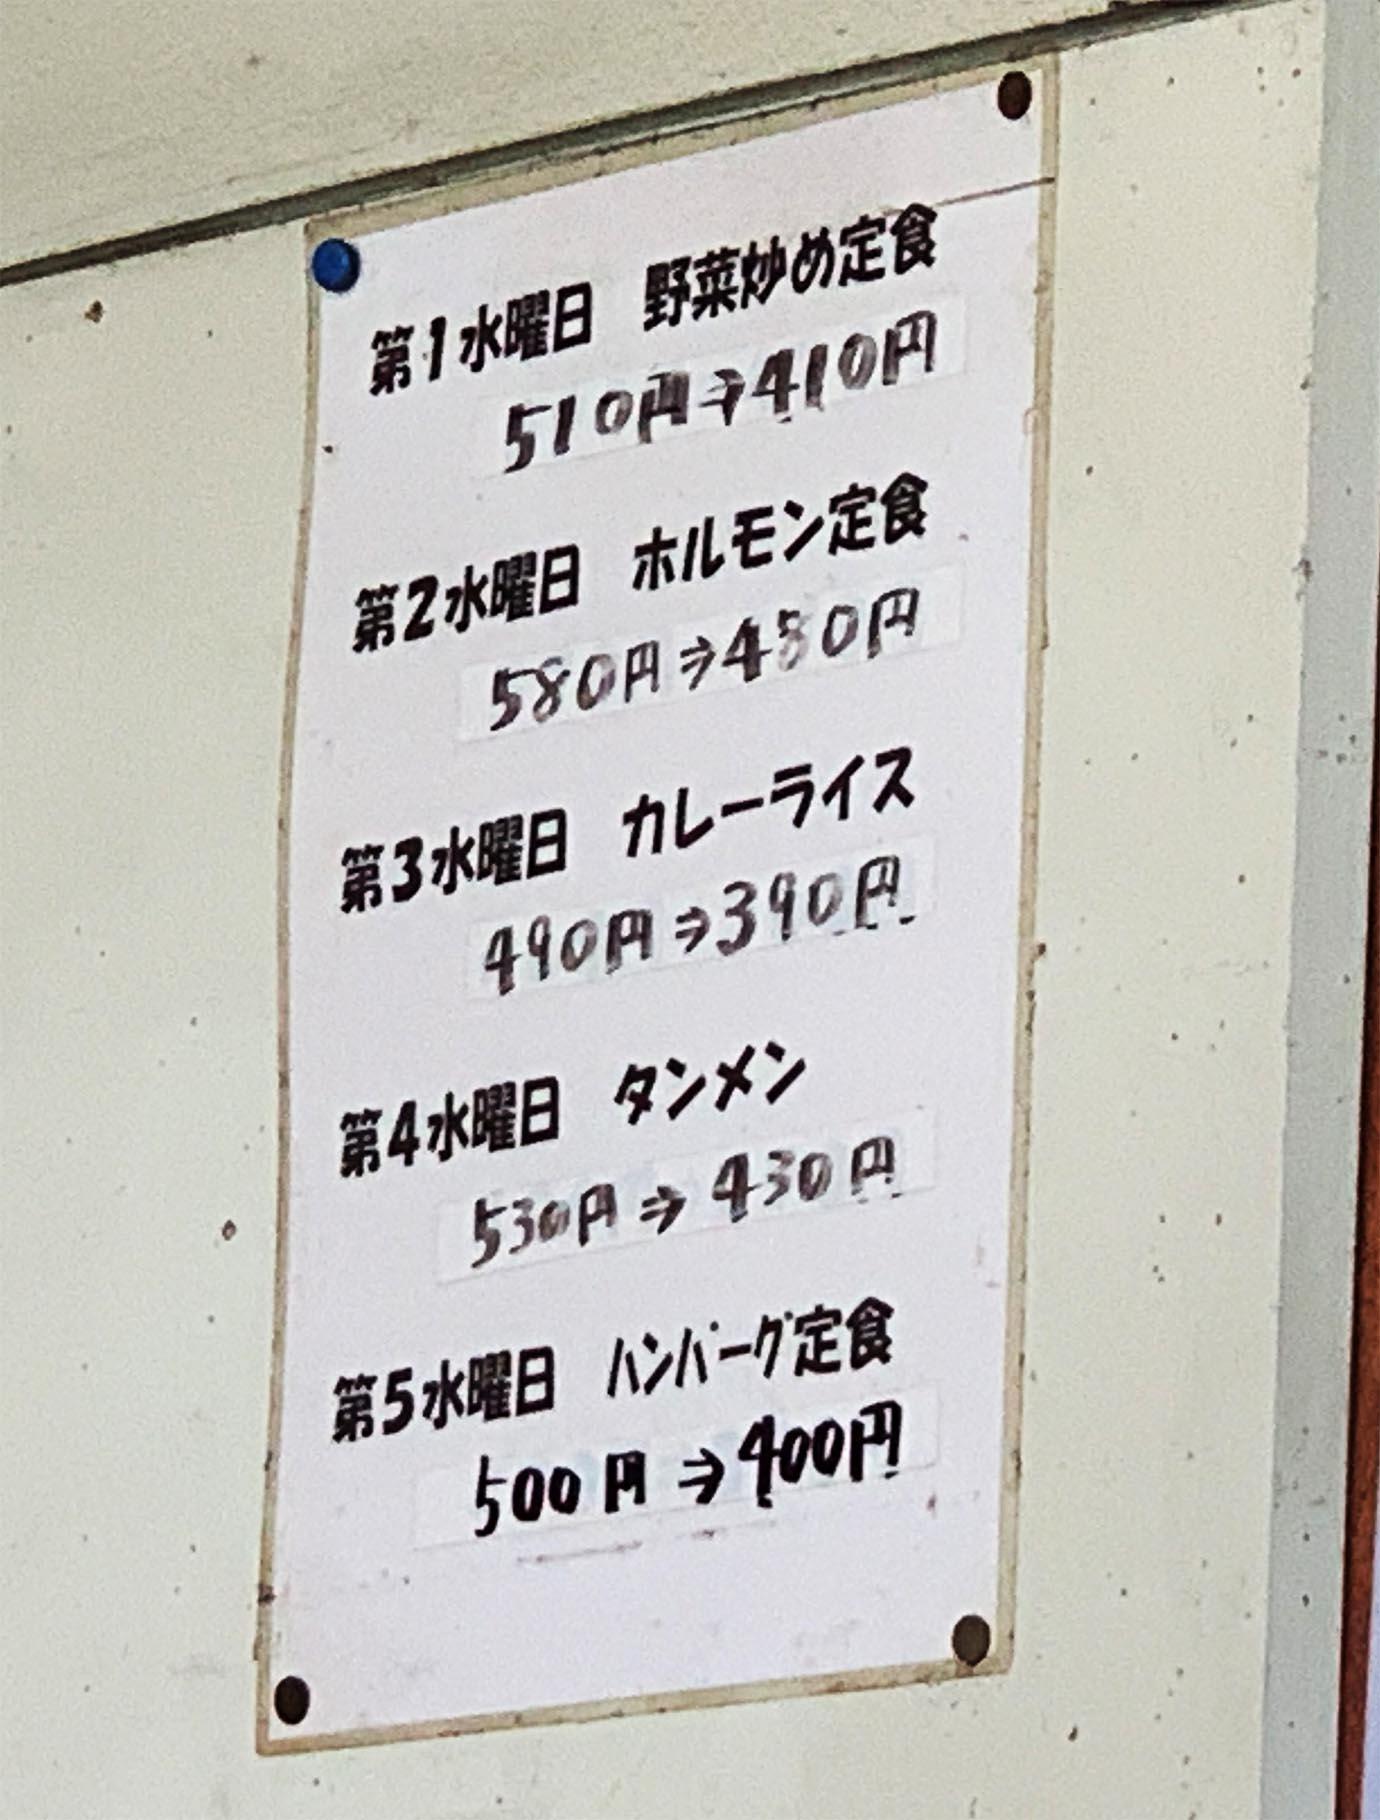 akita-bus-driver-cafeteria8